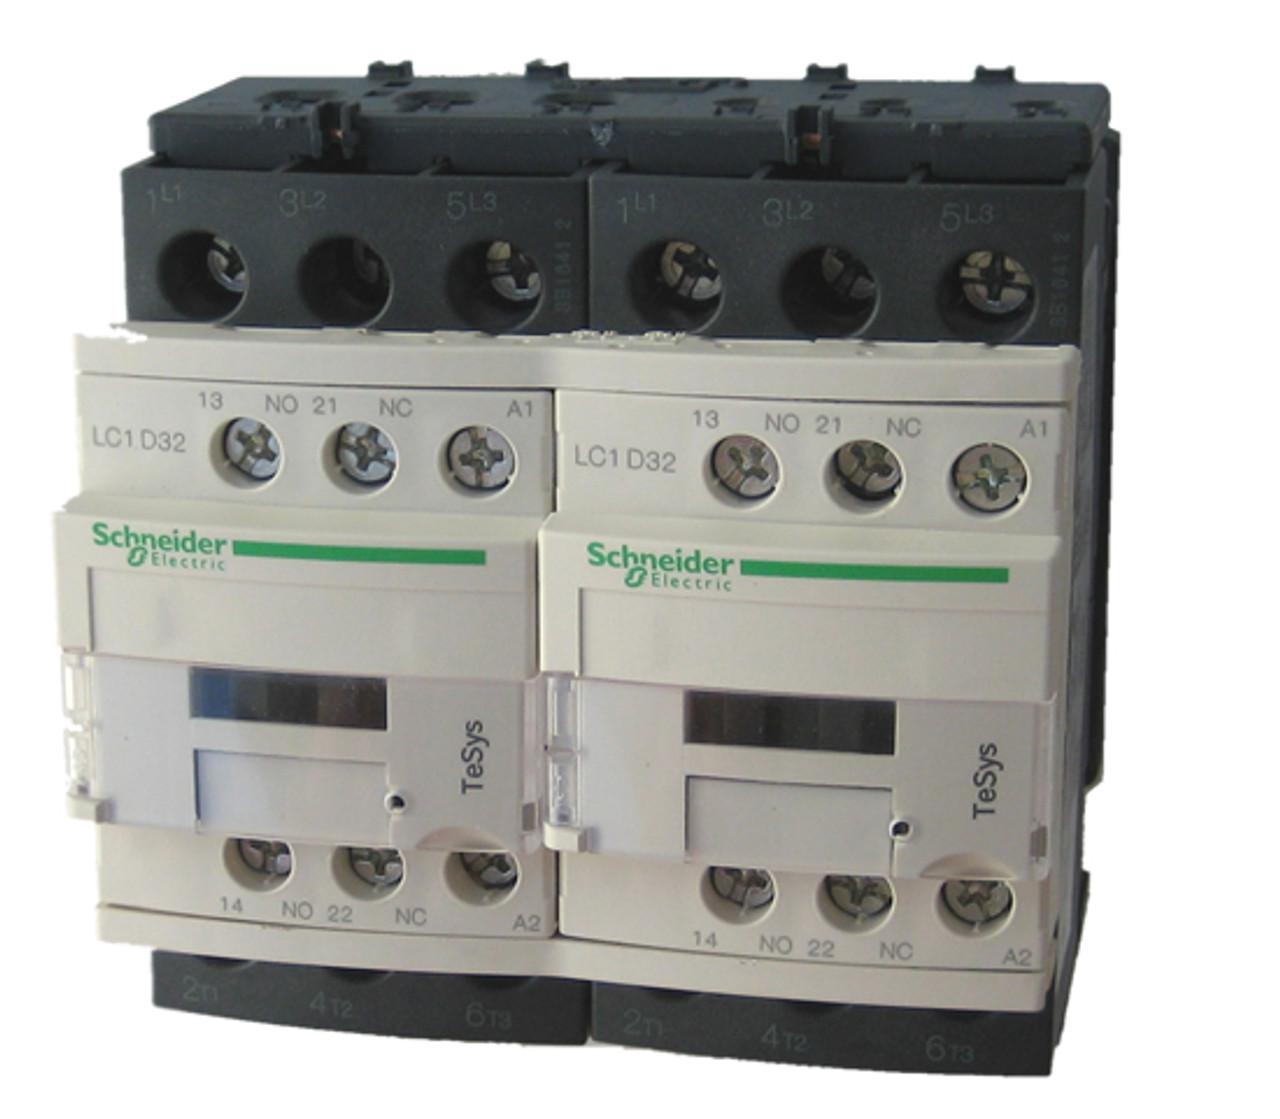 LC1D32G7-Schneider Electric Contactor 3POLE 32AMP 120VOLT Din Rail LC1